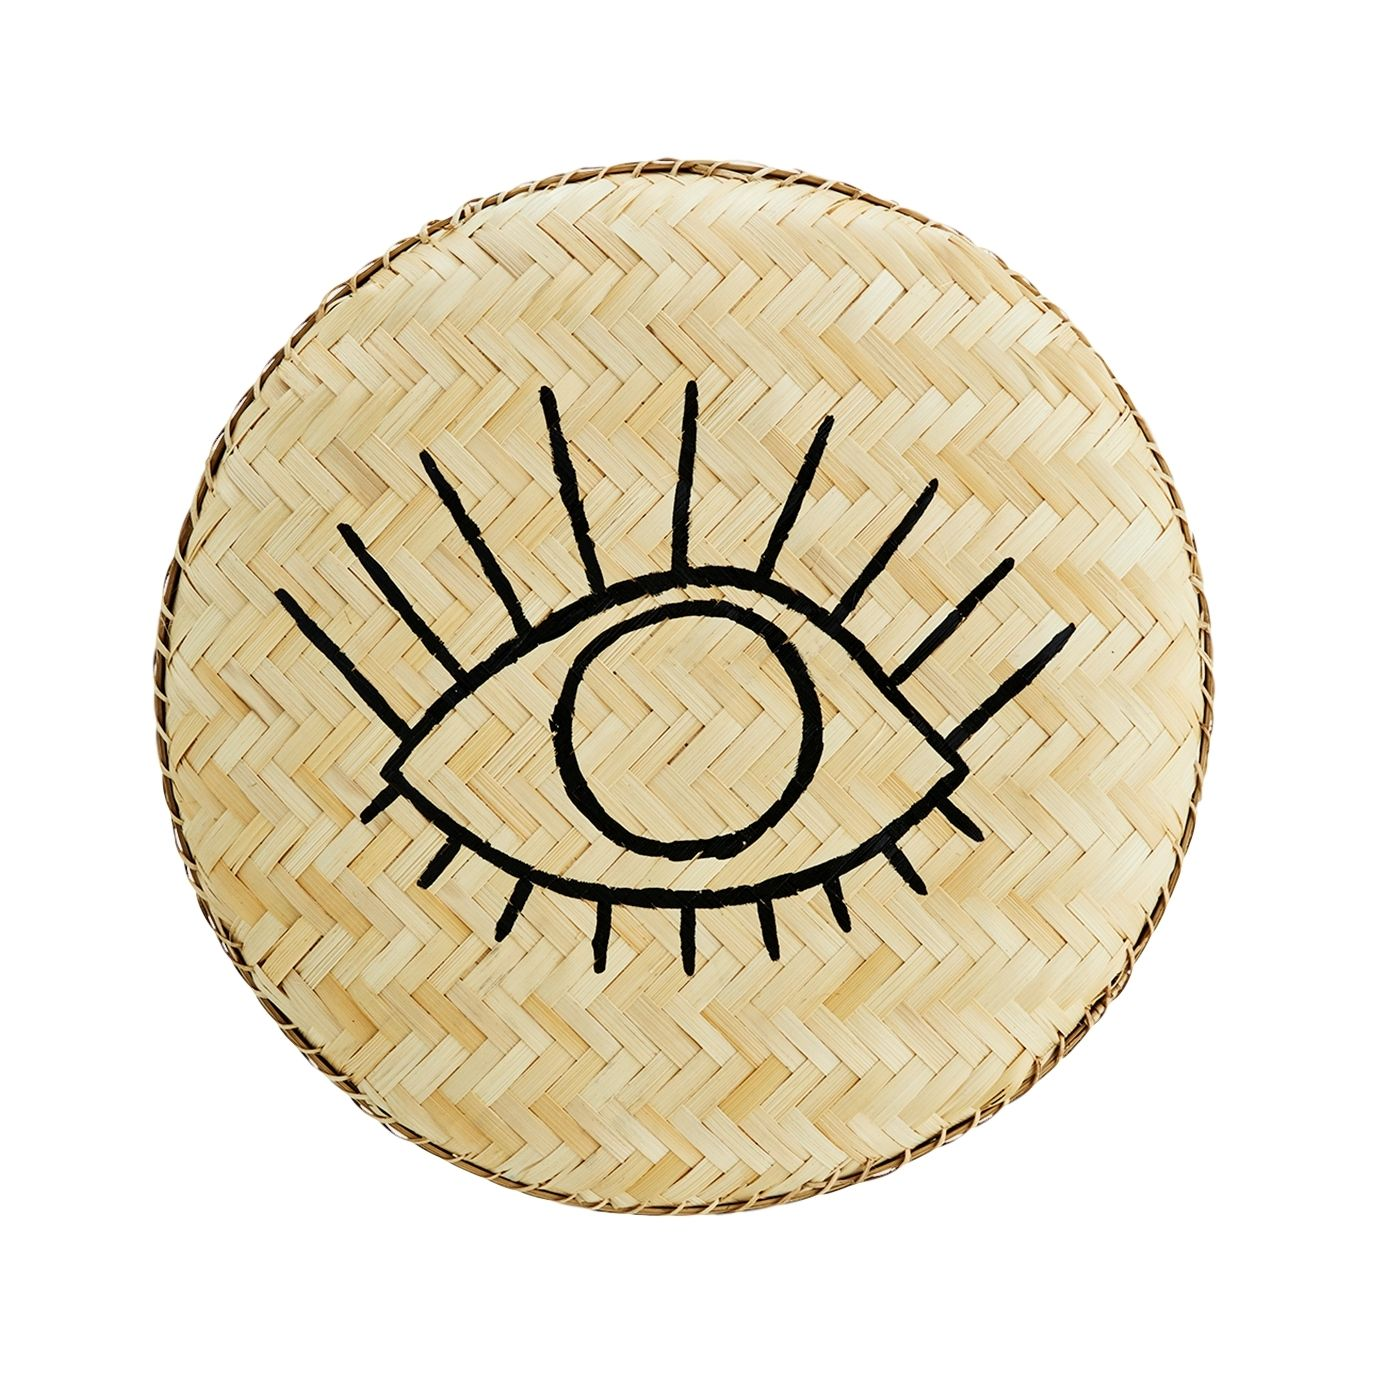 Madam Stoltz - Bamboo tray with handpainted eye - 1